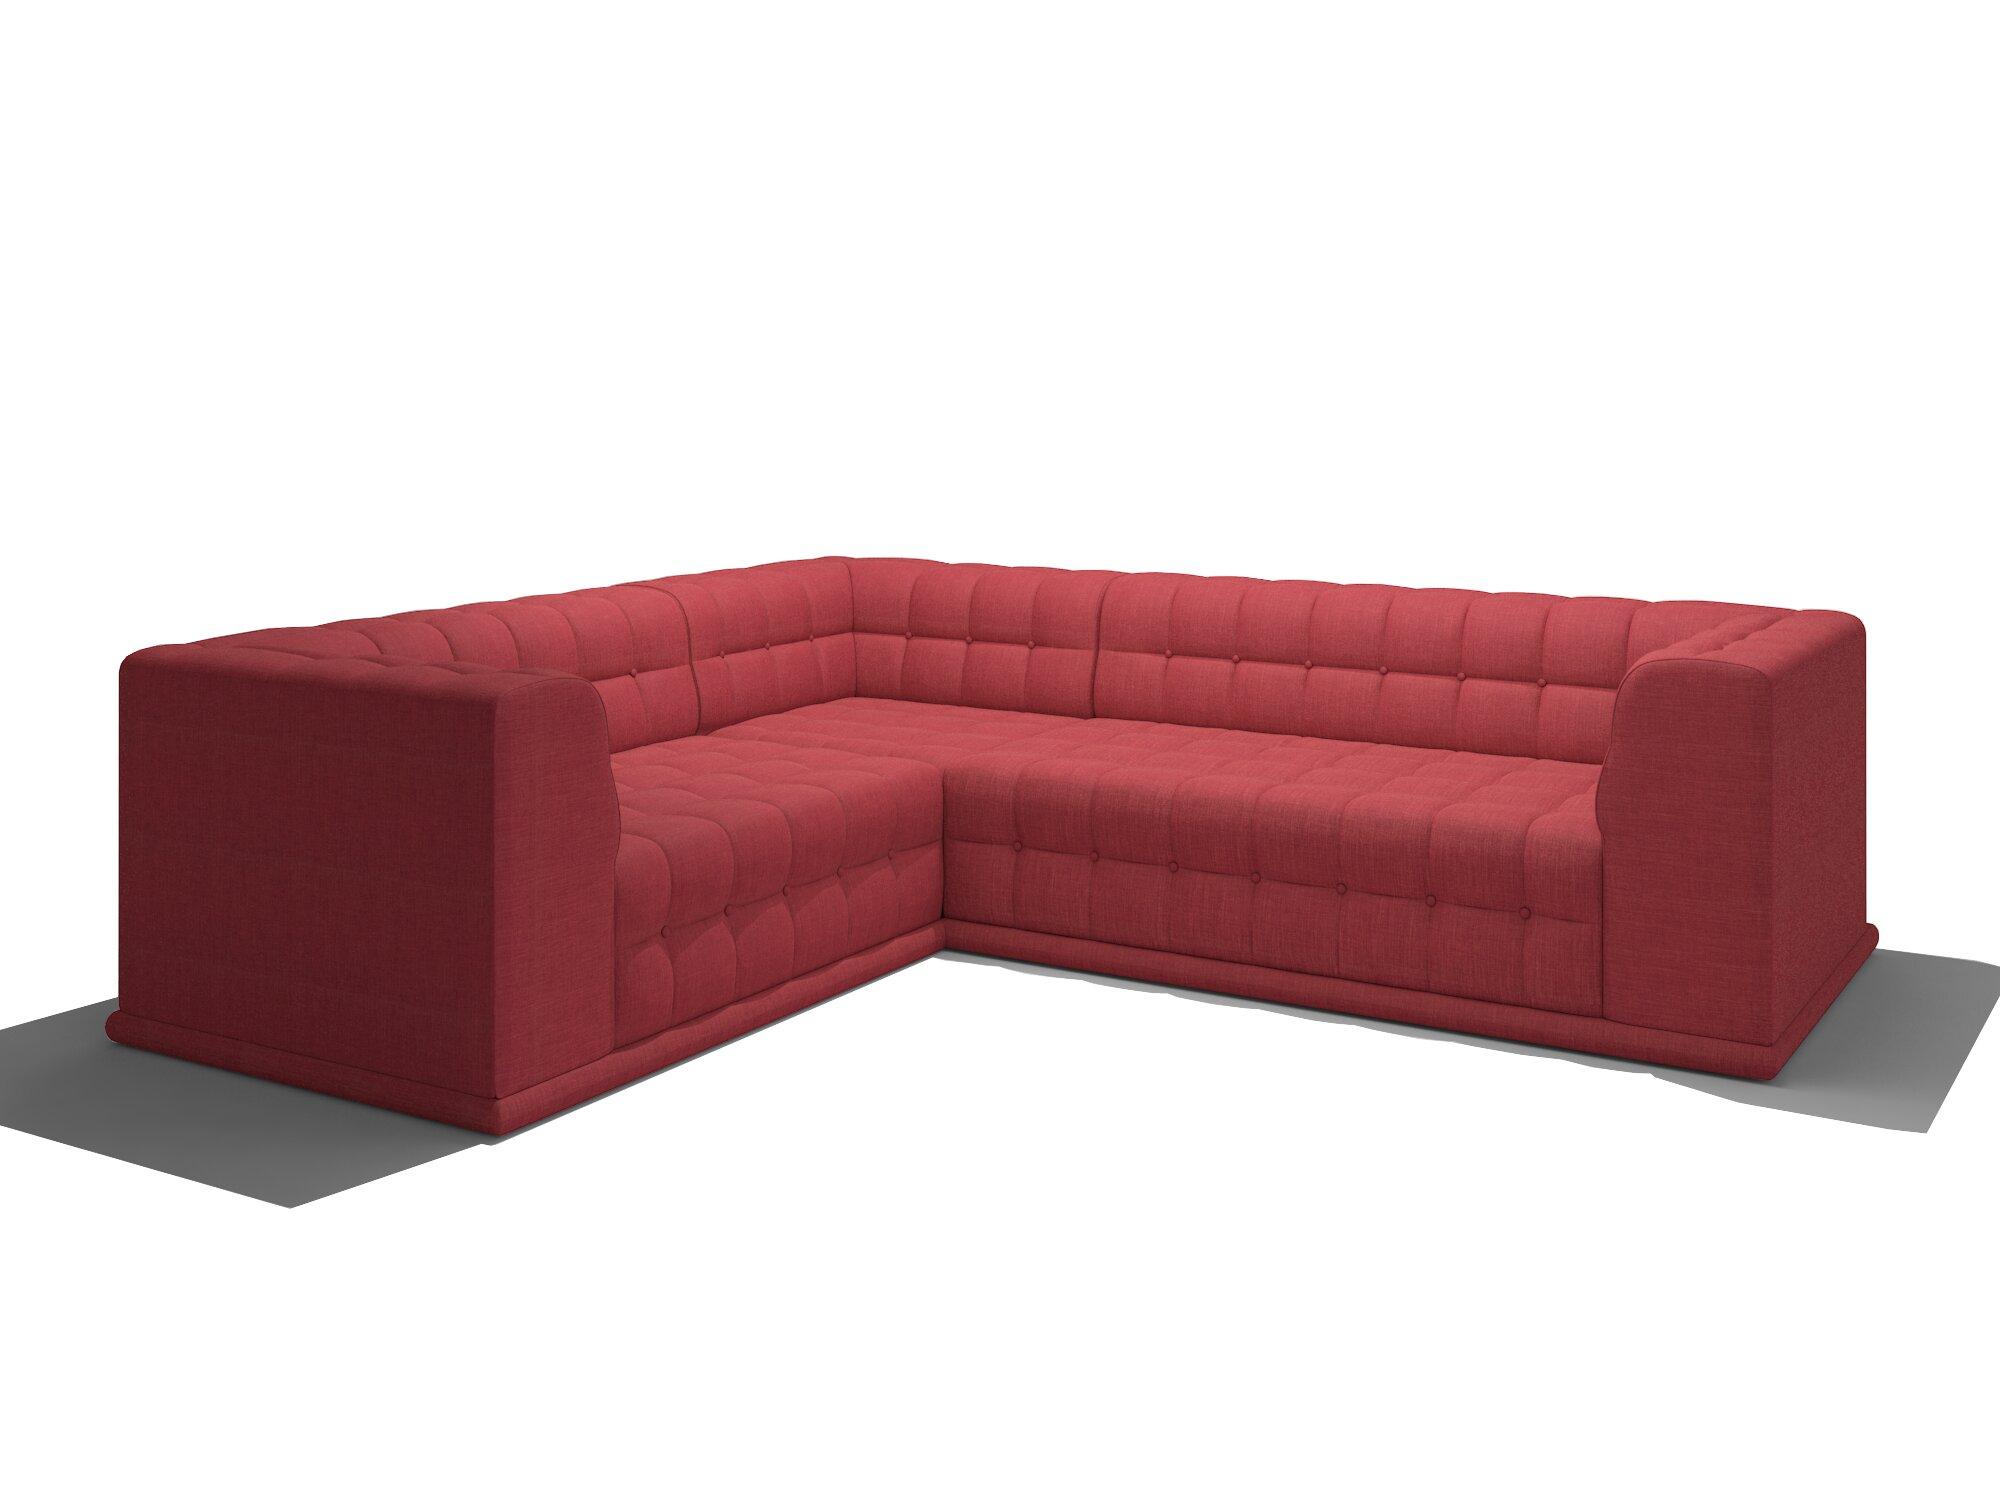 Truemodern bump bump corner sectional wayfair